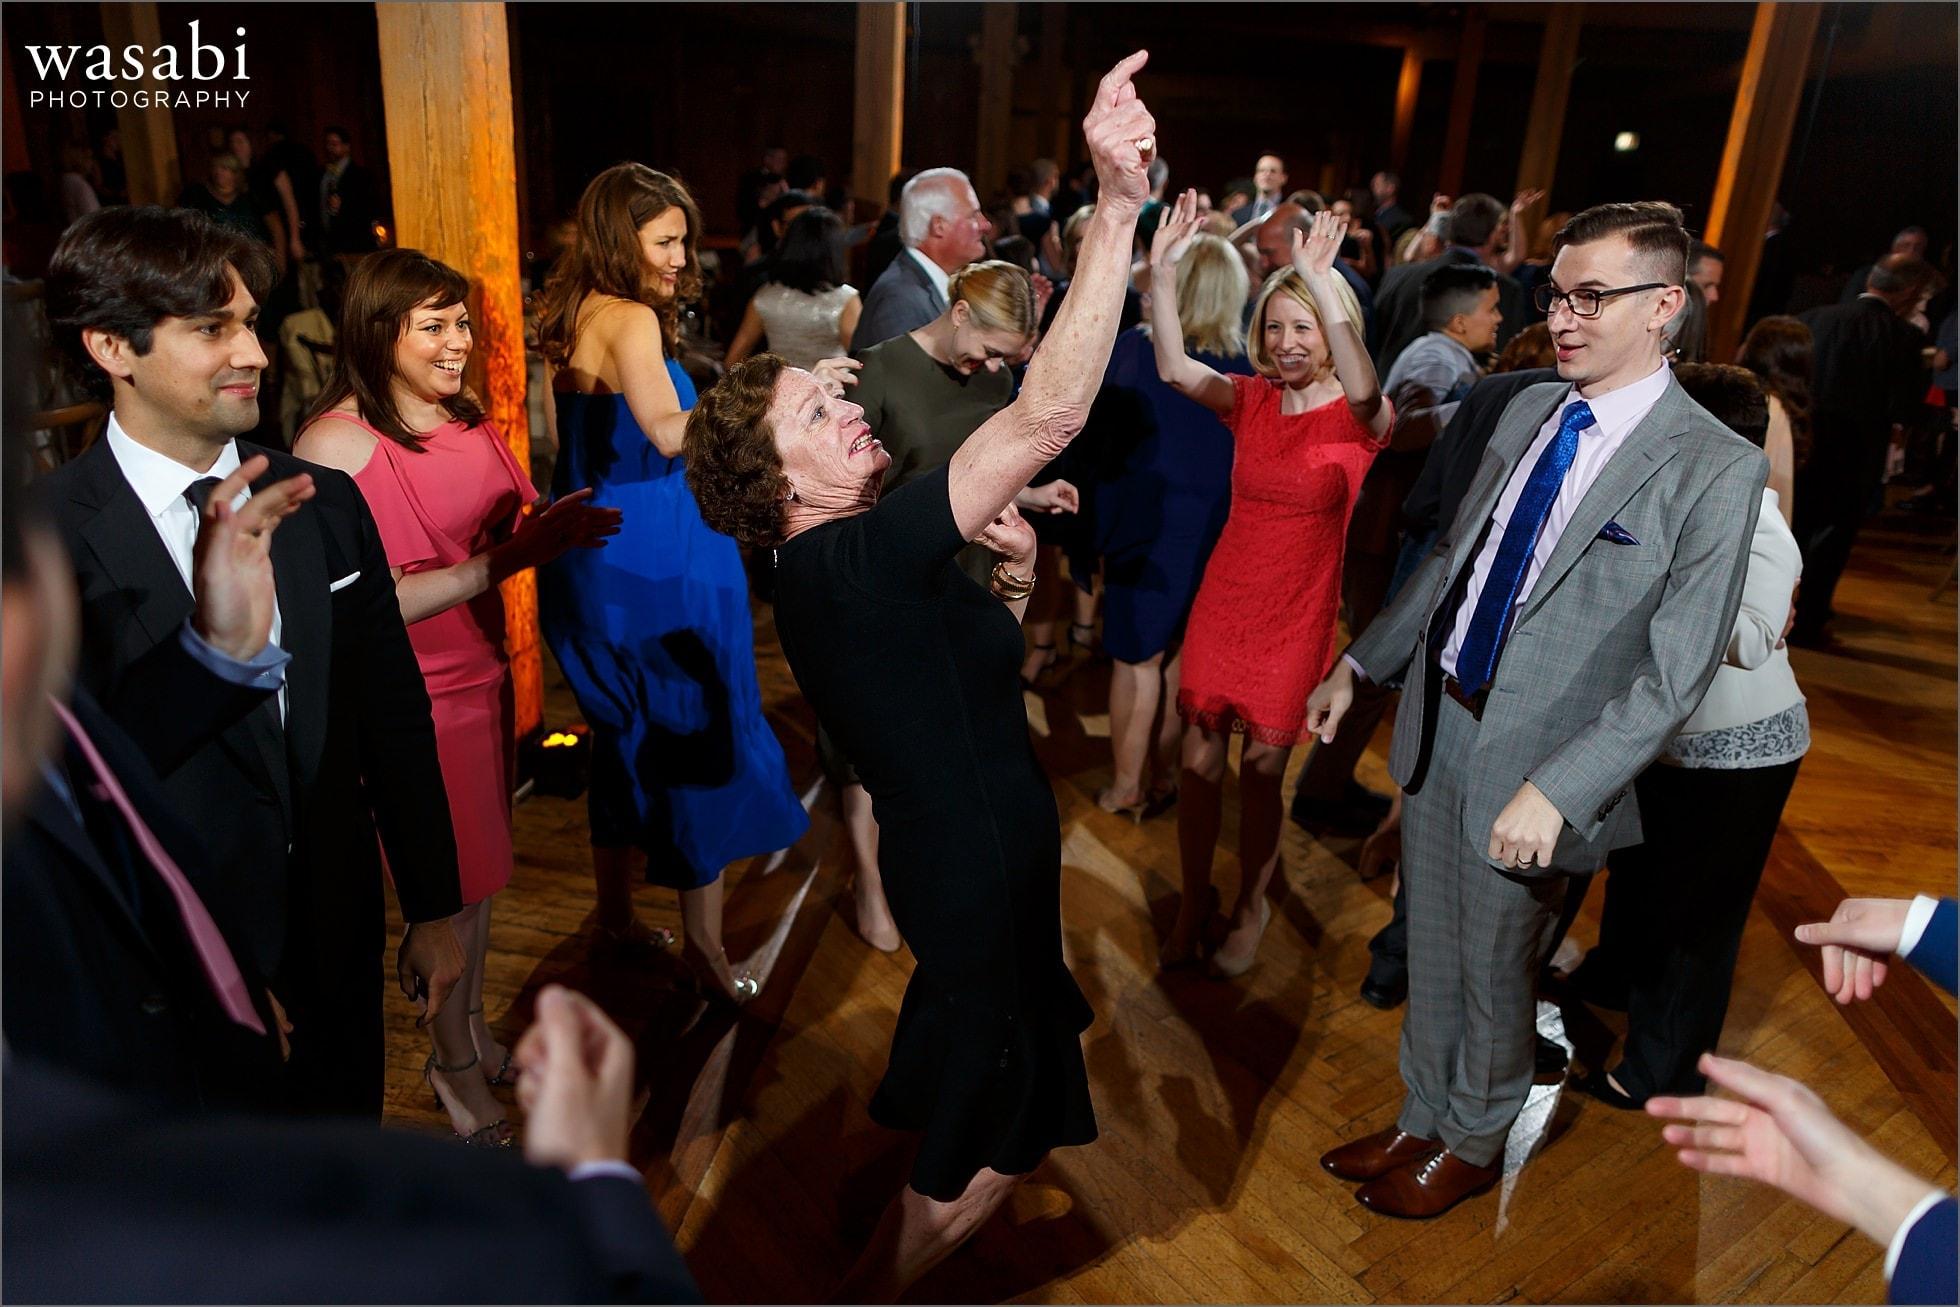 grandmother shows dance moves during wedding reception at Bridgeport Art Centers Skyline Loft